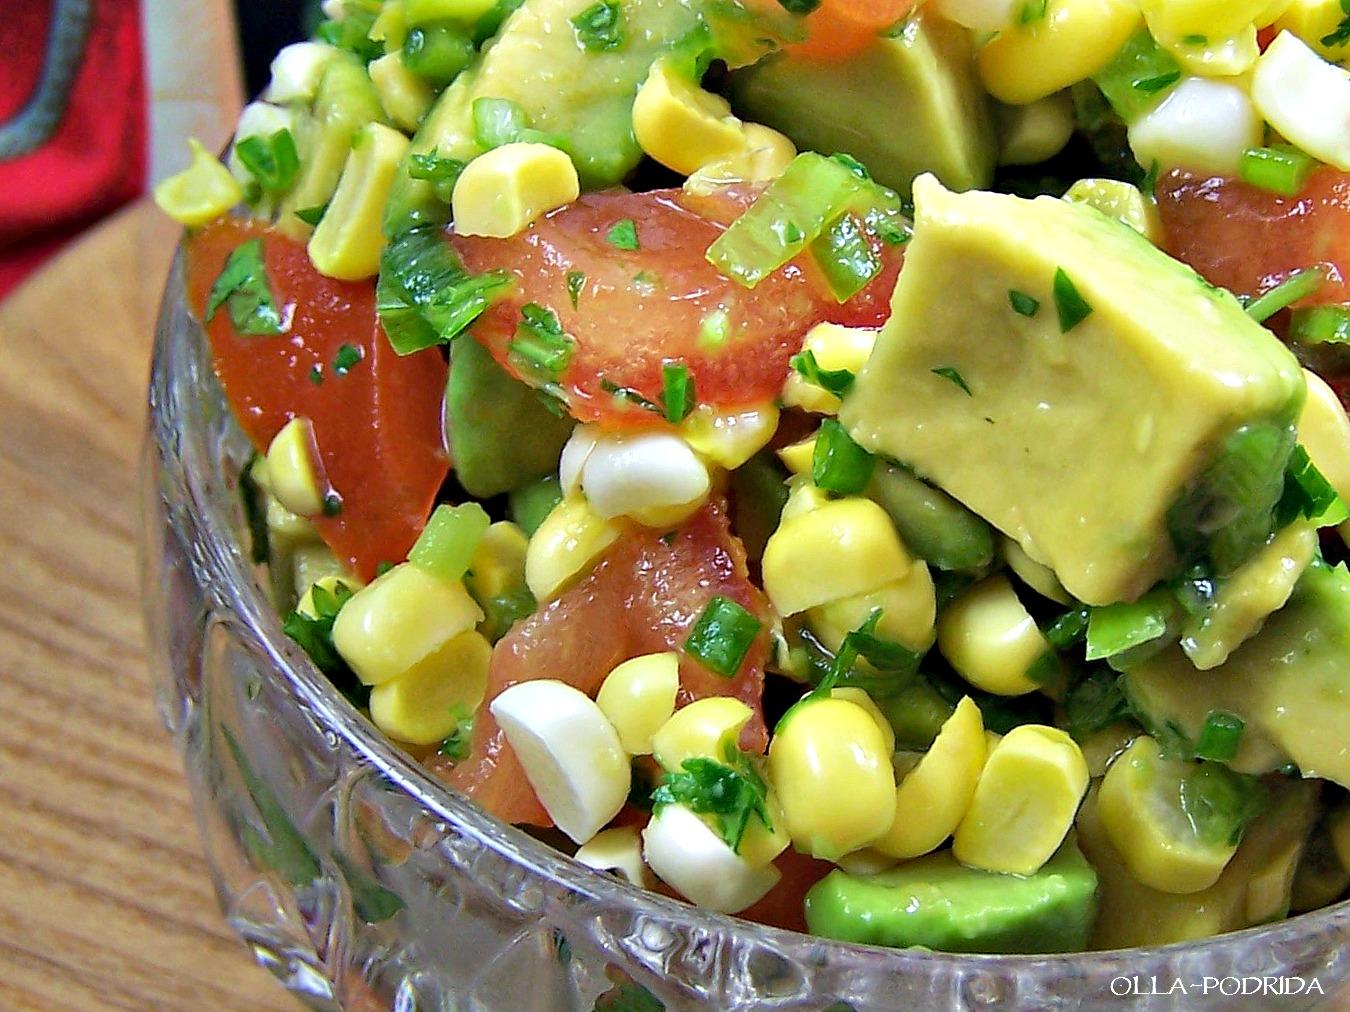 Olla-Podrida: Avocado and Corn Salsa